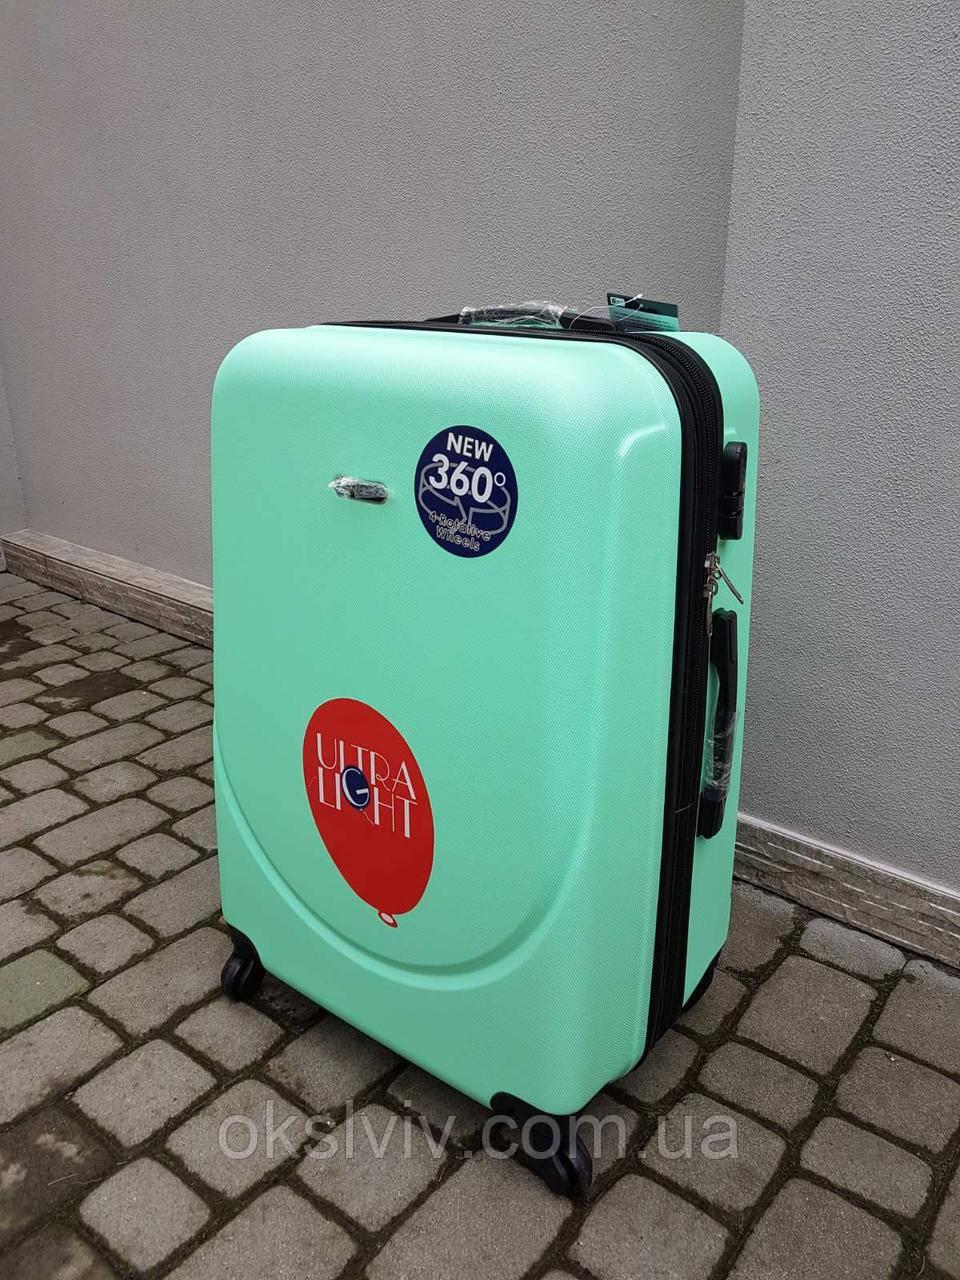 FLY 310 Польща валізи Чемодани сумки на колесах